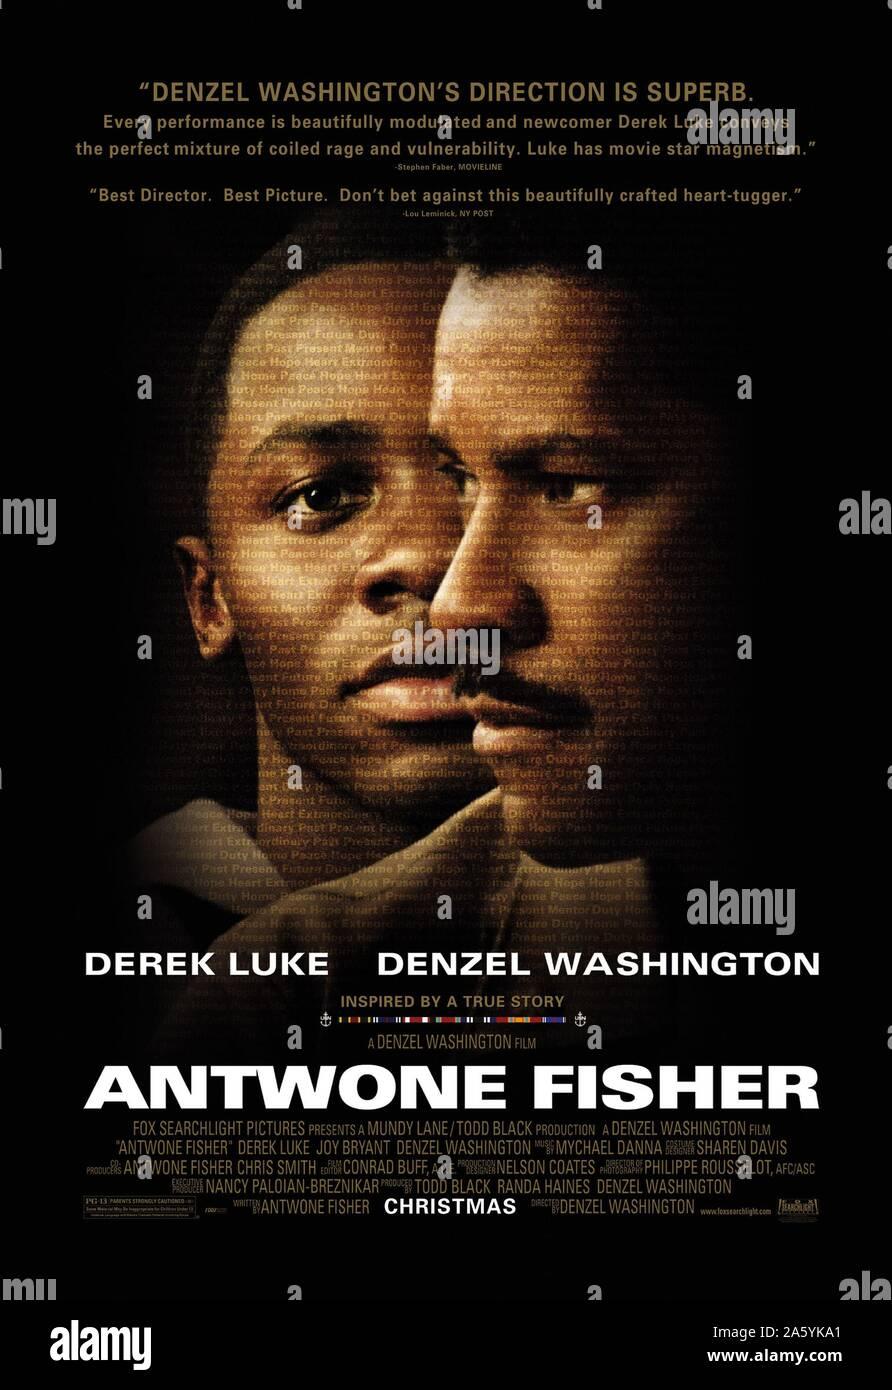 Rahim Année: 2002 USA Réalisateur: Denzel Washington, Derek Luke, Denzel Washington l'affiche (USA) Banque D'Images